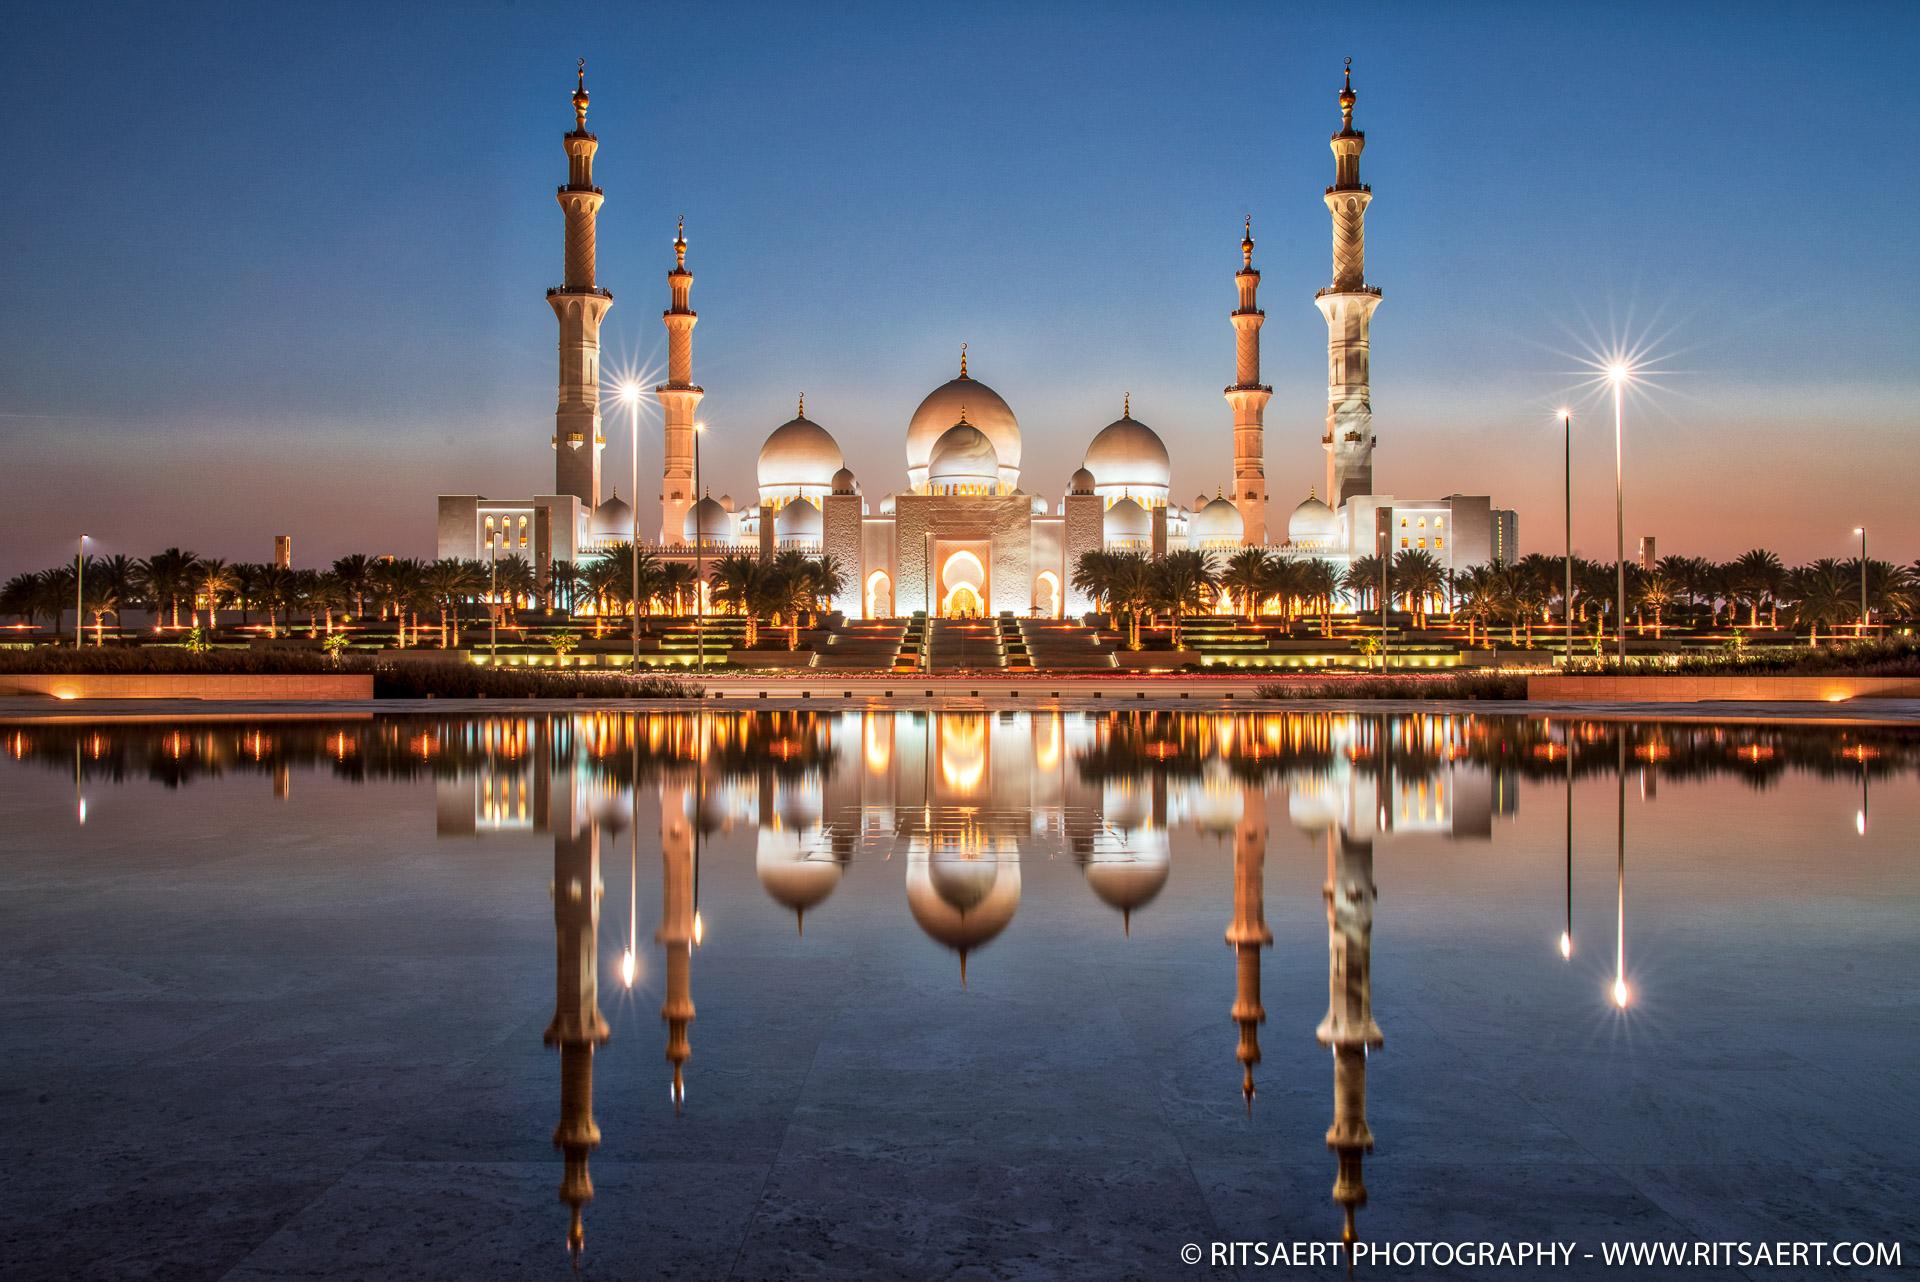 Sunset at Sheikh Zayed Grand Mosque - Abu Dhabi